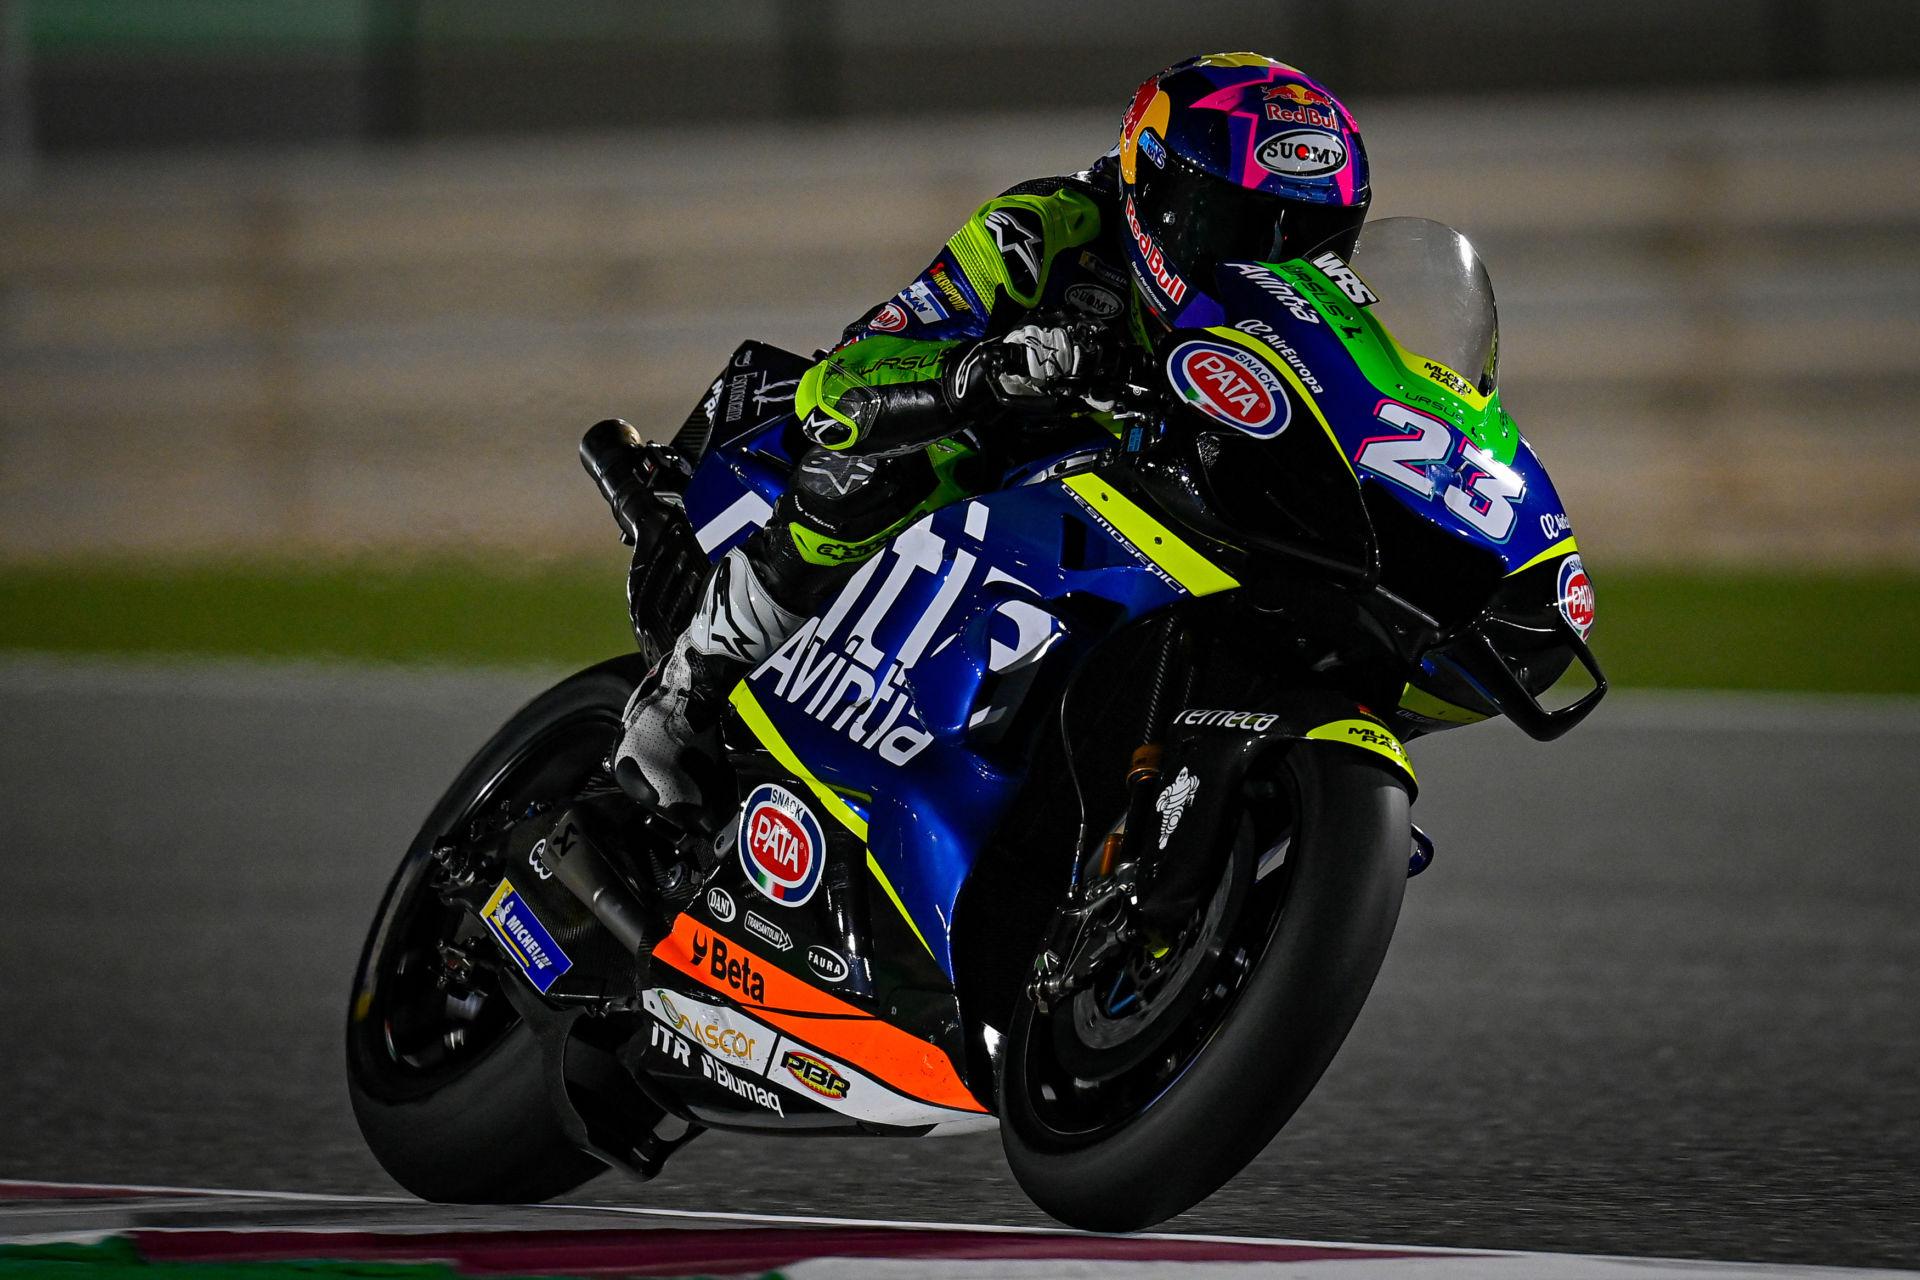 MotoGP rookie Enea Bastianini (23). Photo courtesy Dorna.